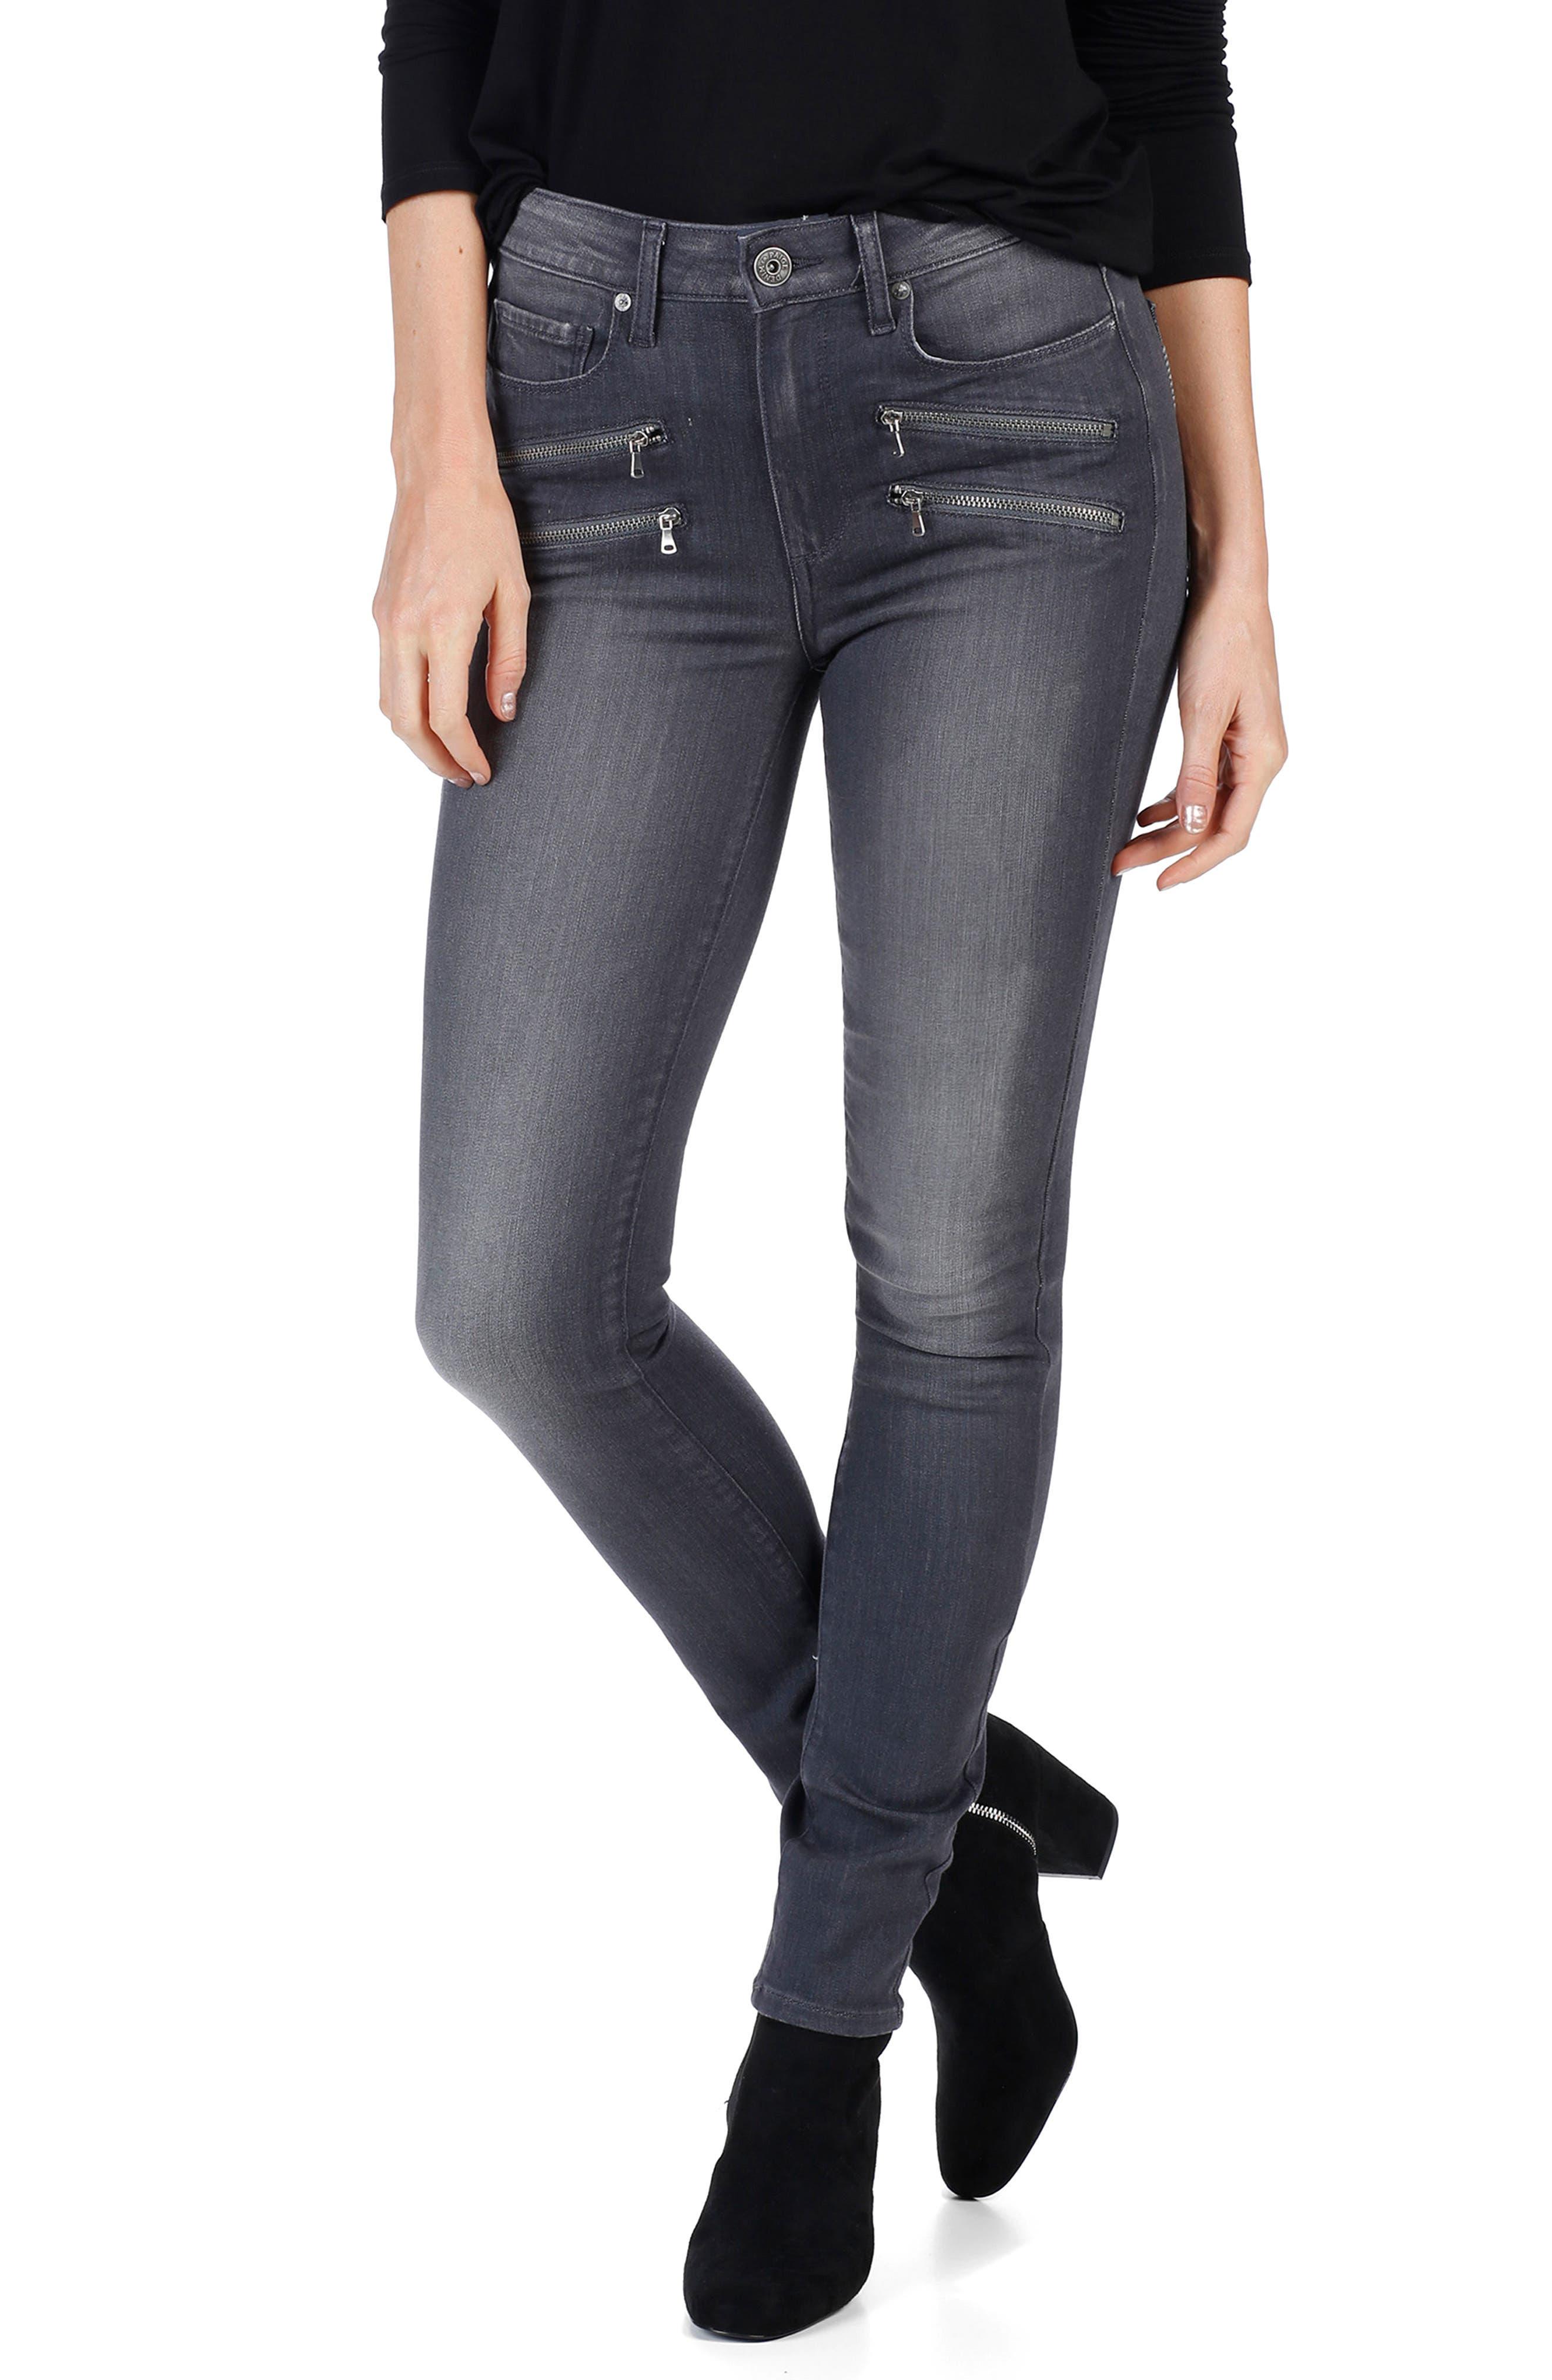 Women's Grey Wash Jeans & Denim | Nordstrom